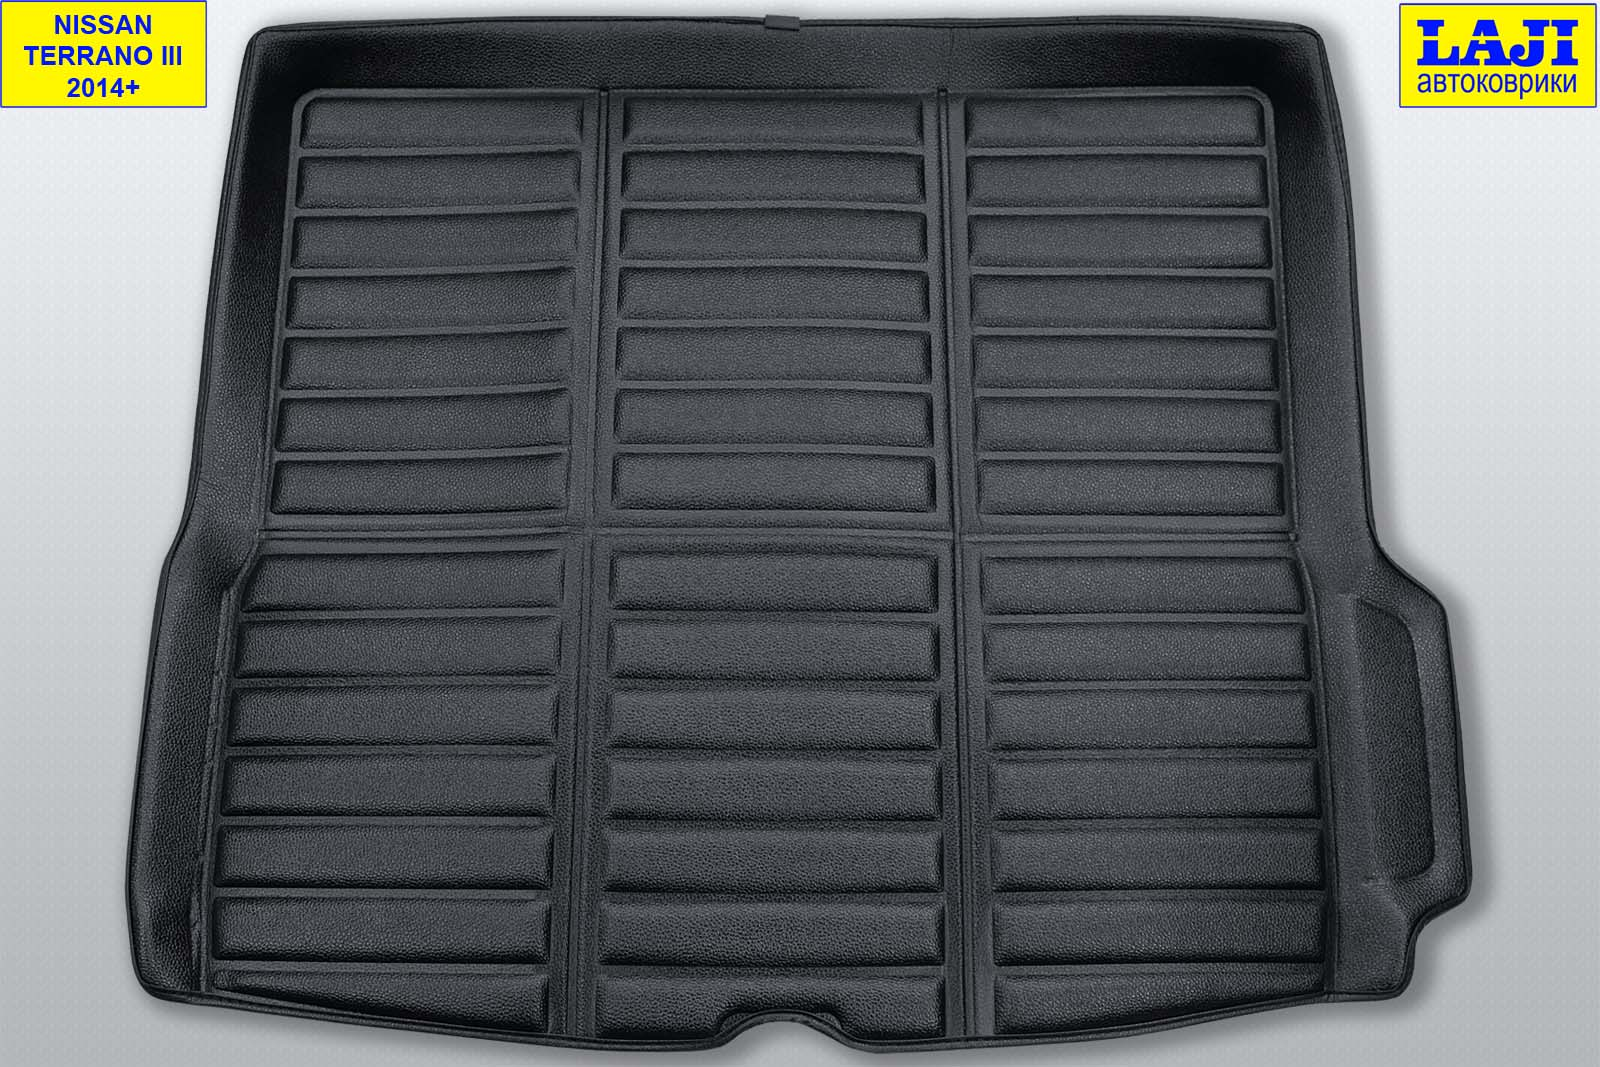 3D коврик в багажник Nissan Terrano D10 2010-н.в. 1